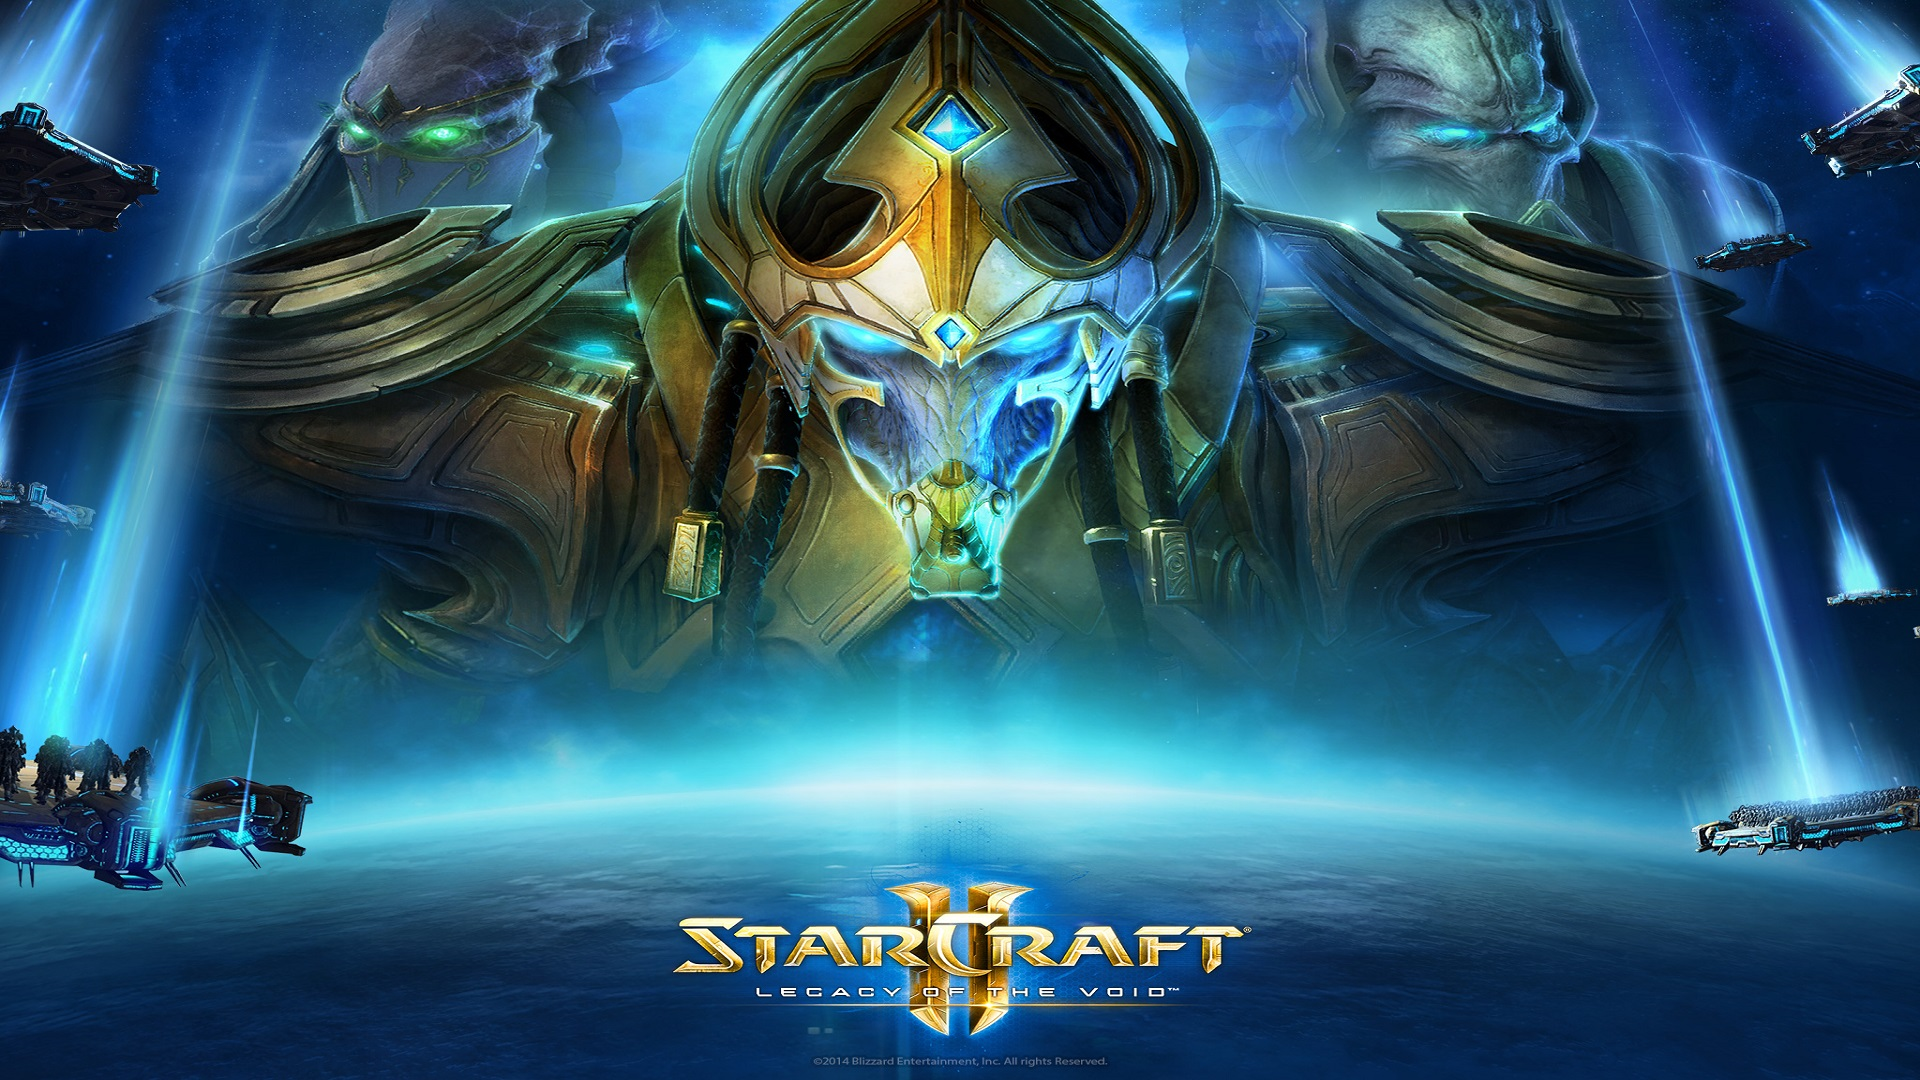 starcraft 2 matchmaking greyed out